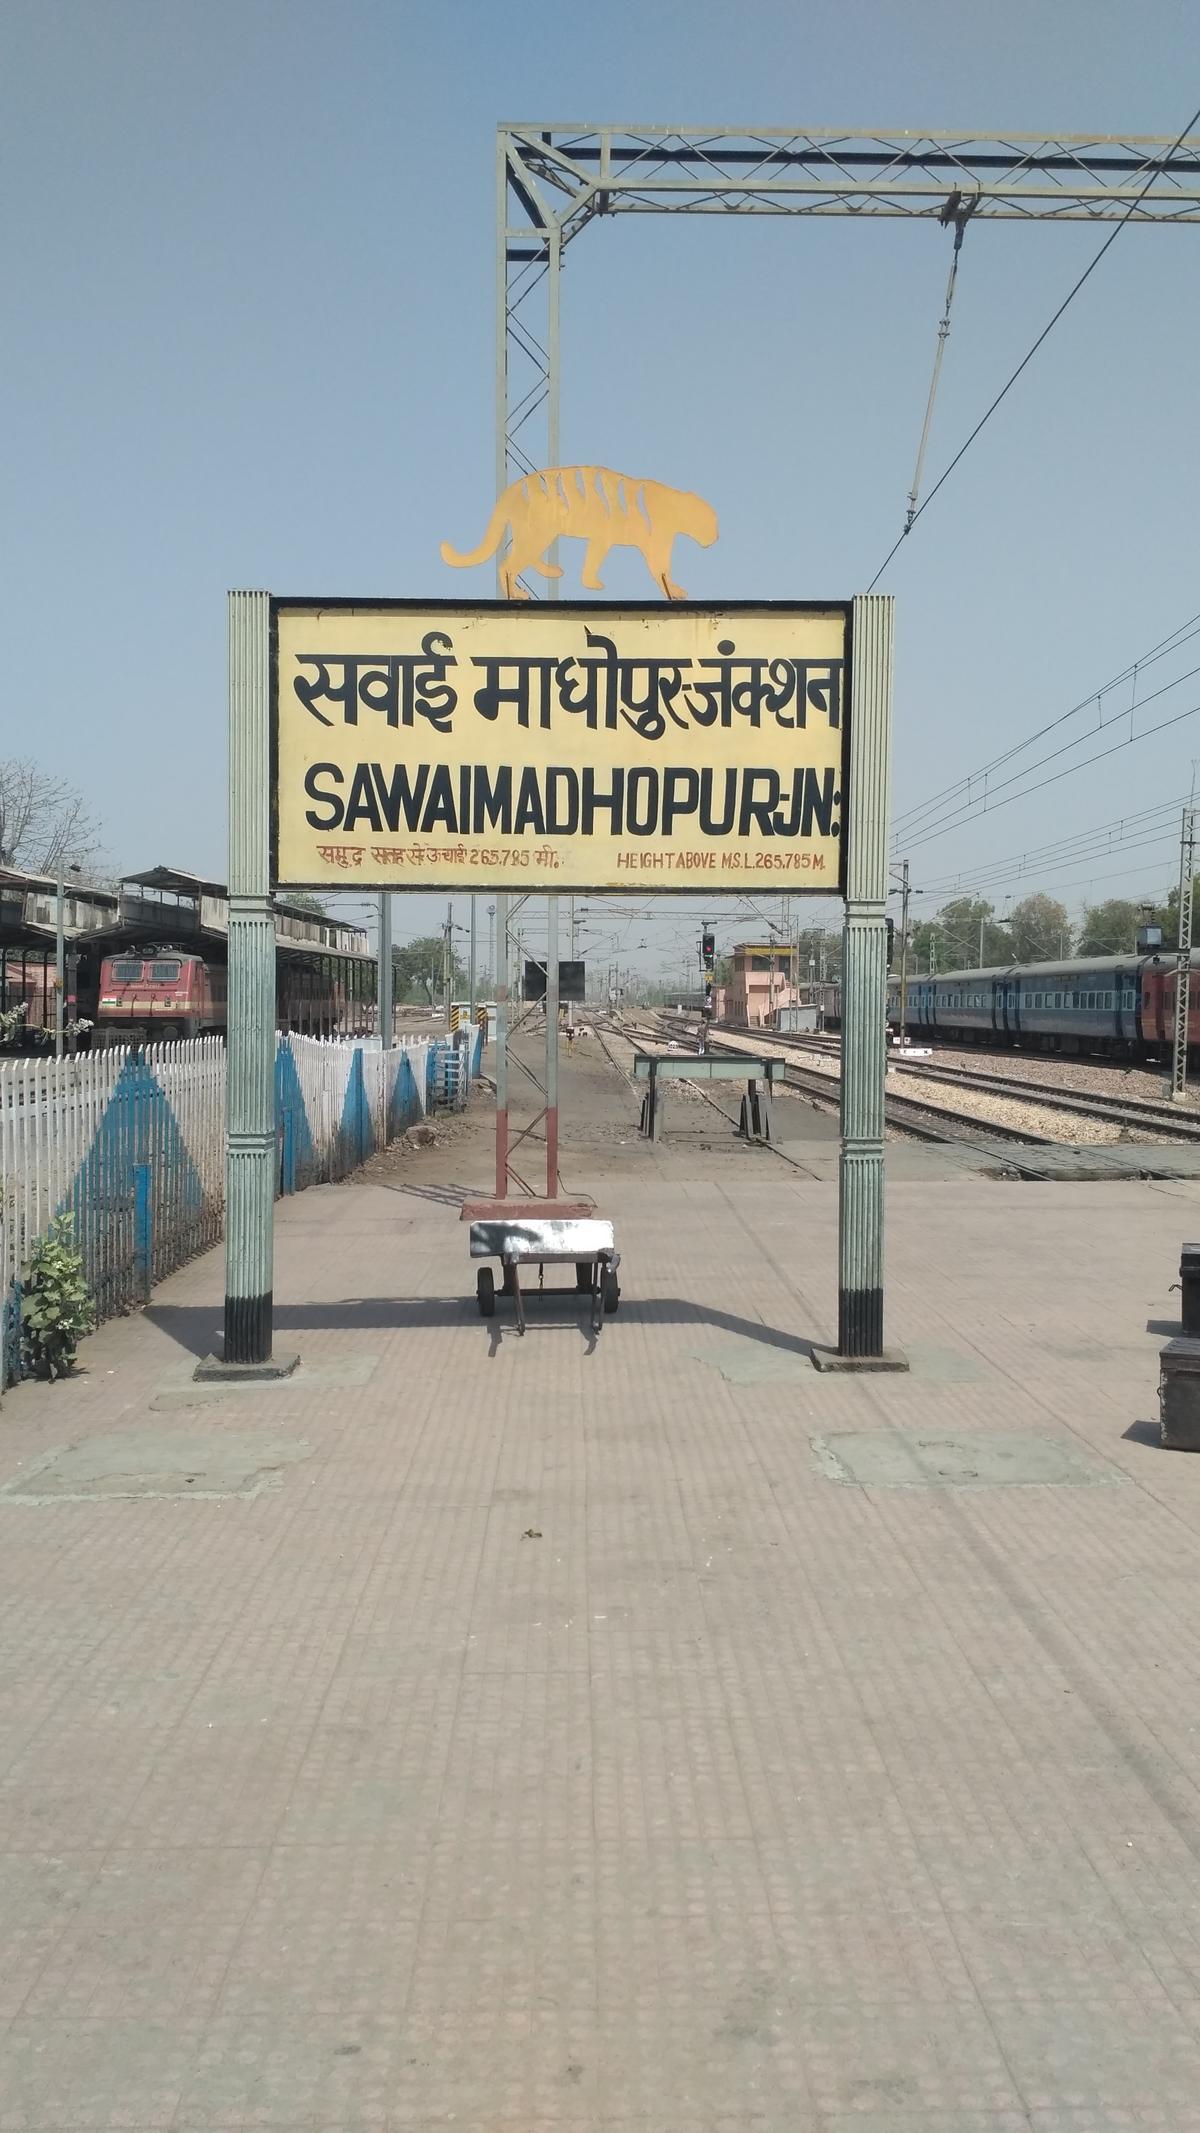 Digital Marketing Course in Sawai Madhopur